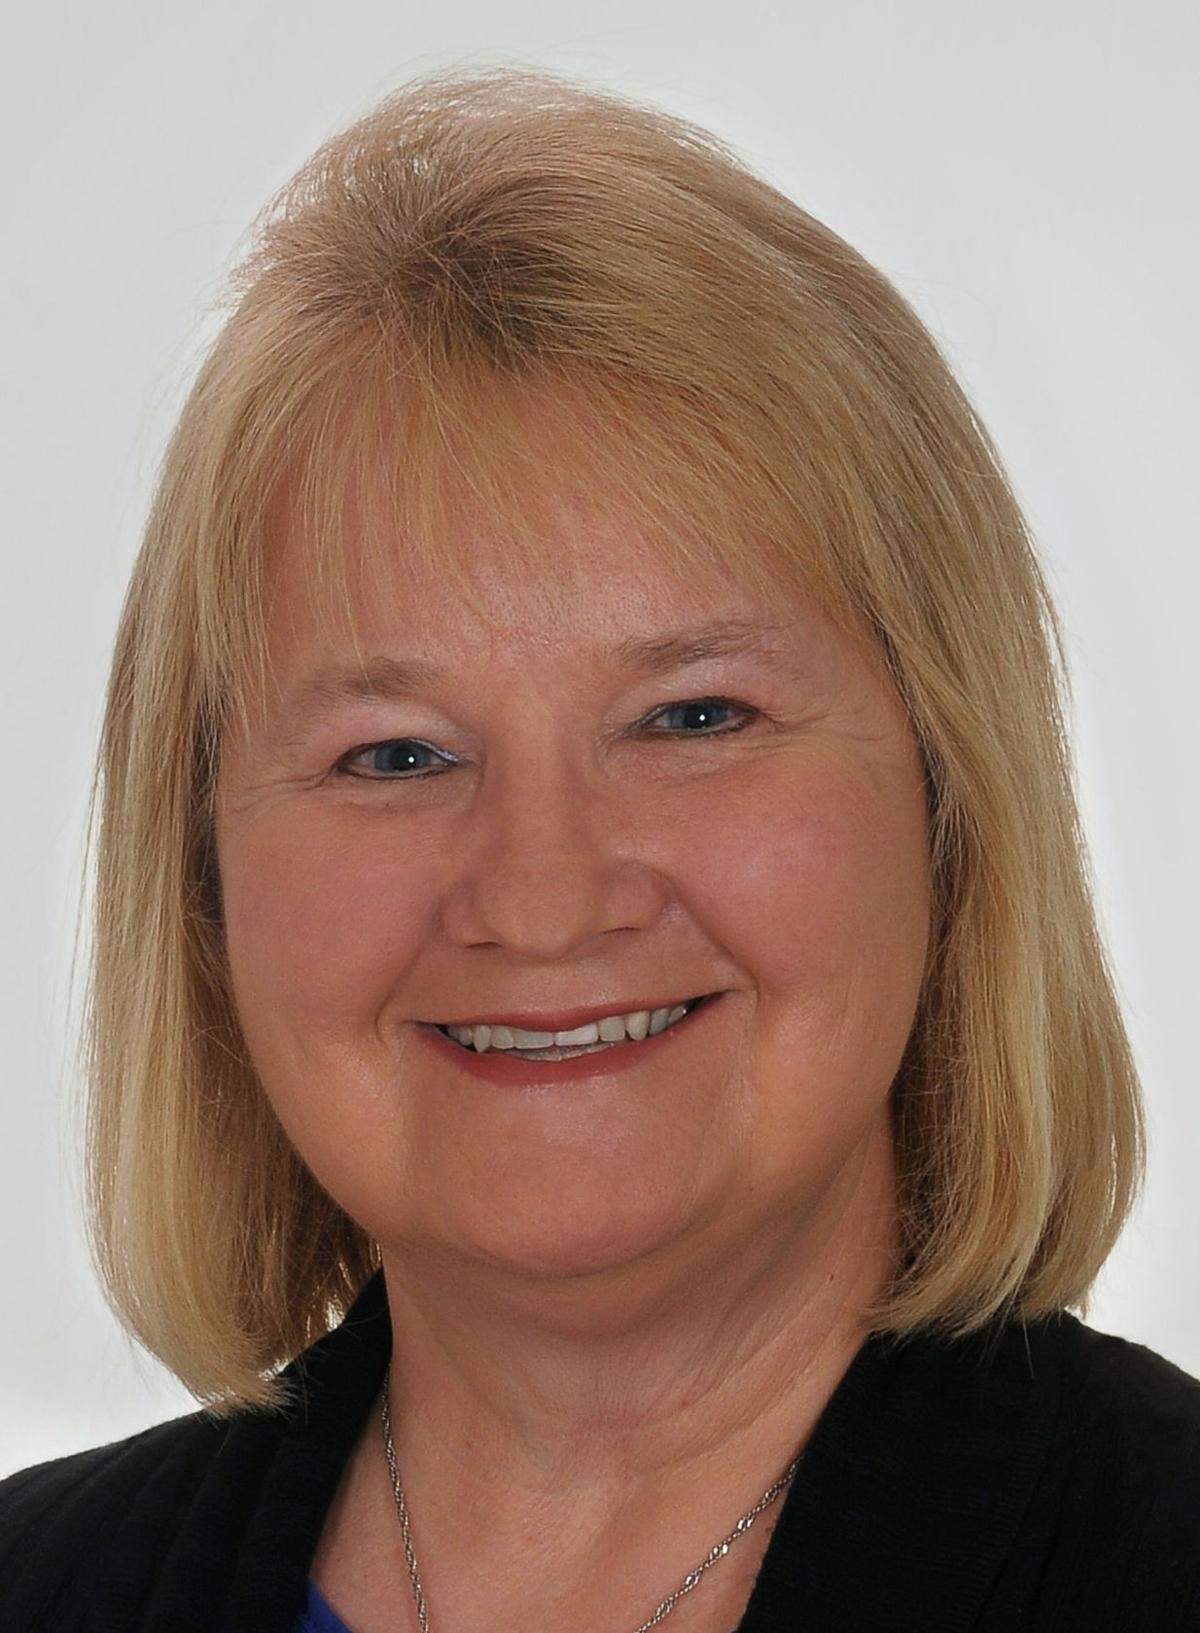 Kathy Alberts